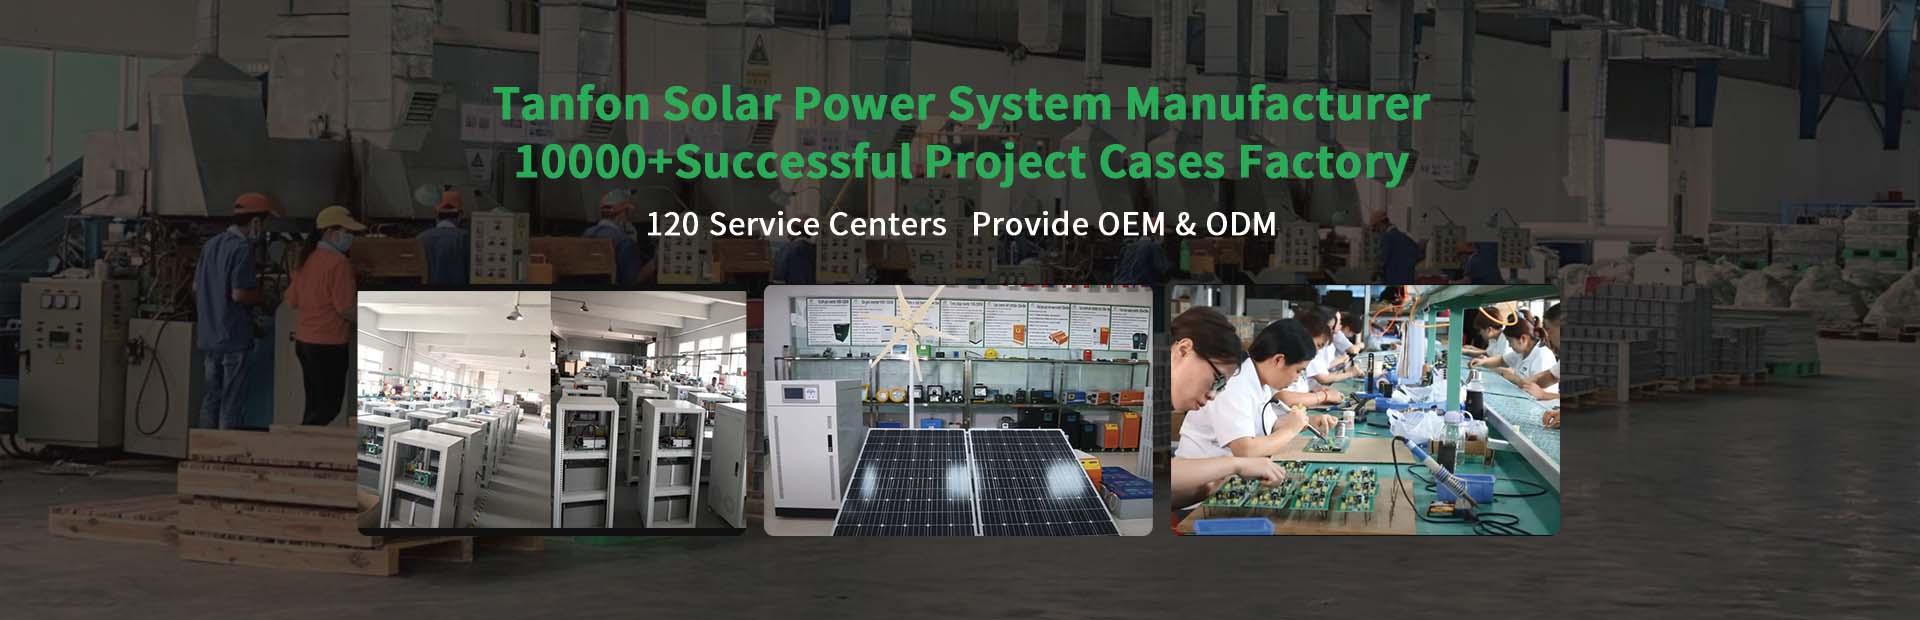 tanfon solar inverter, solar system manufacturer